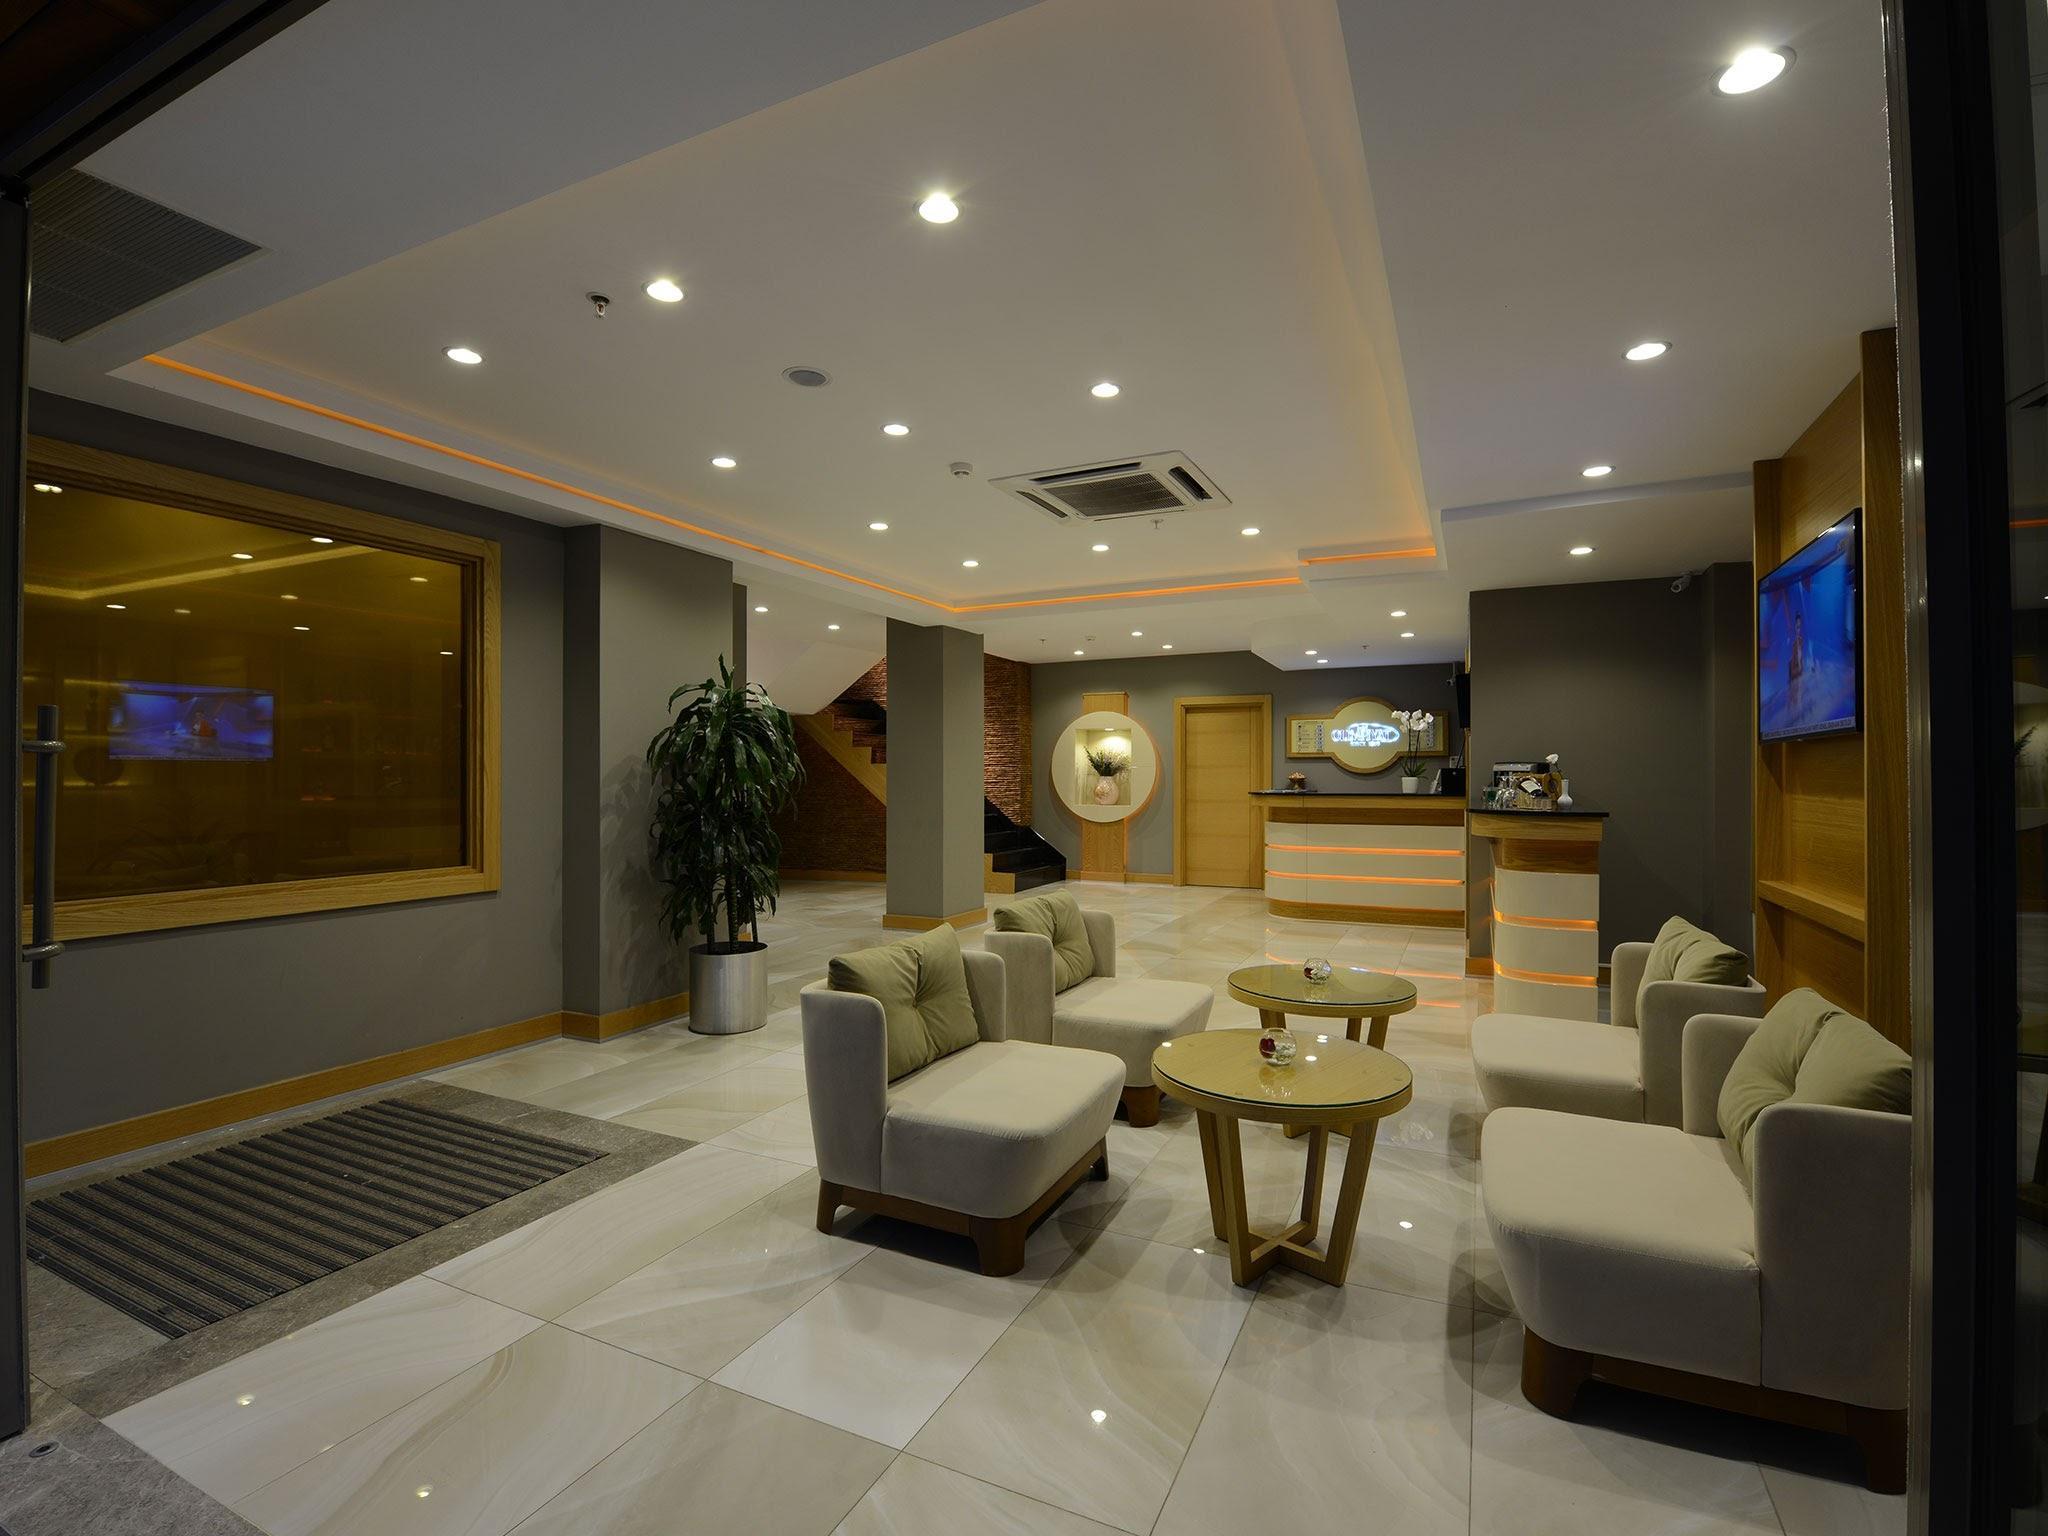 HotelMarkDowns | Save 10-30% on Hotels